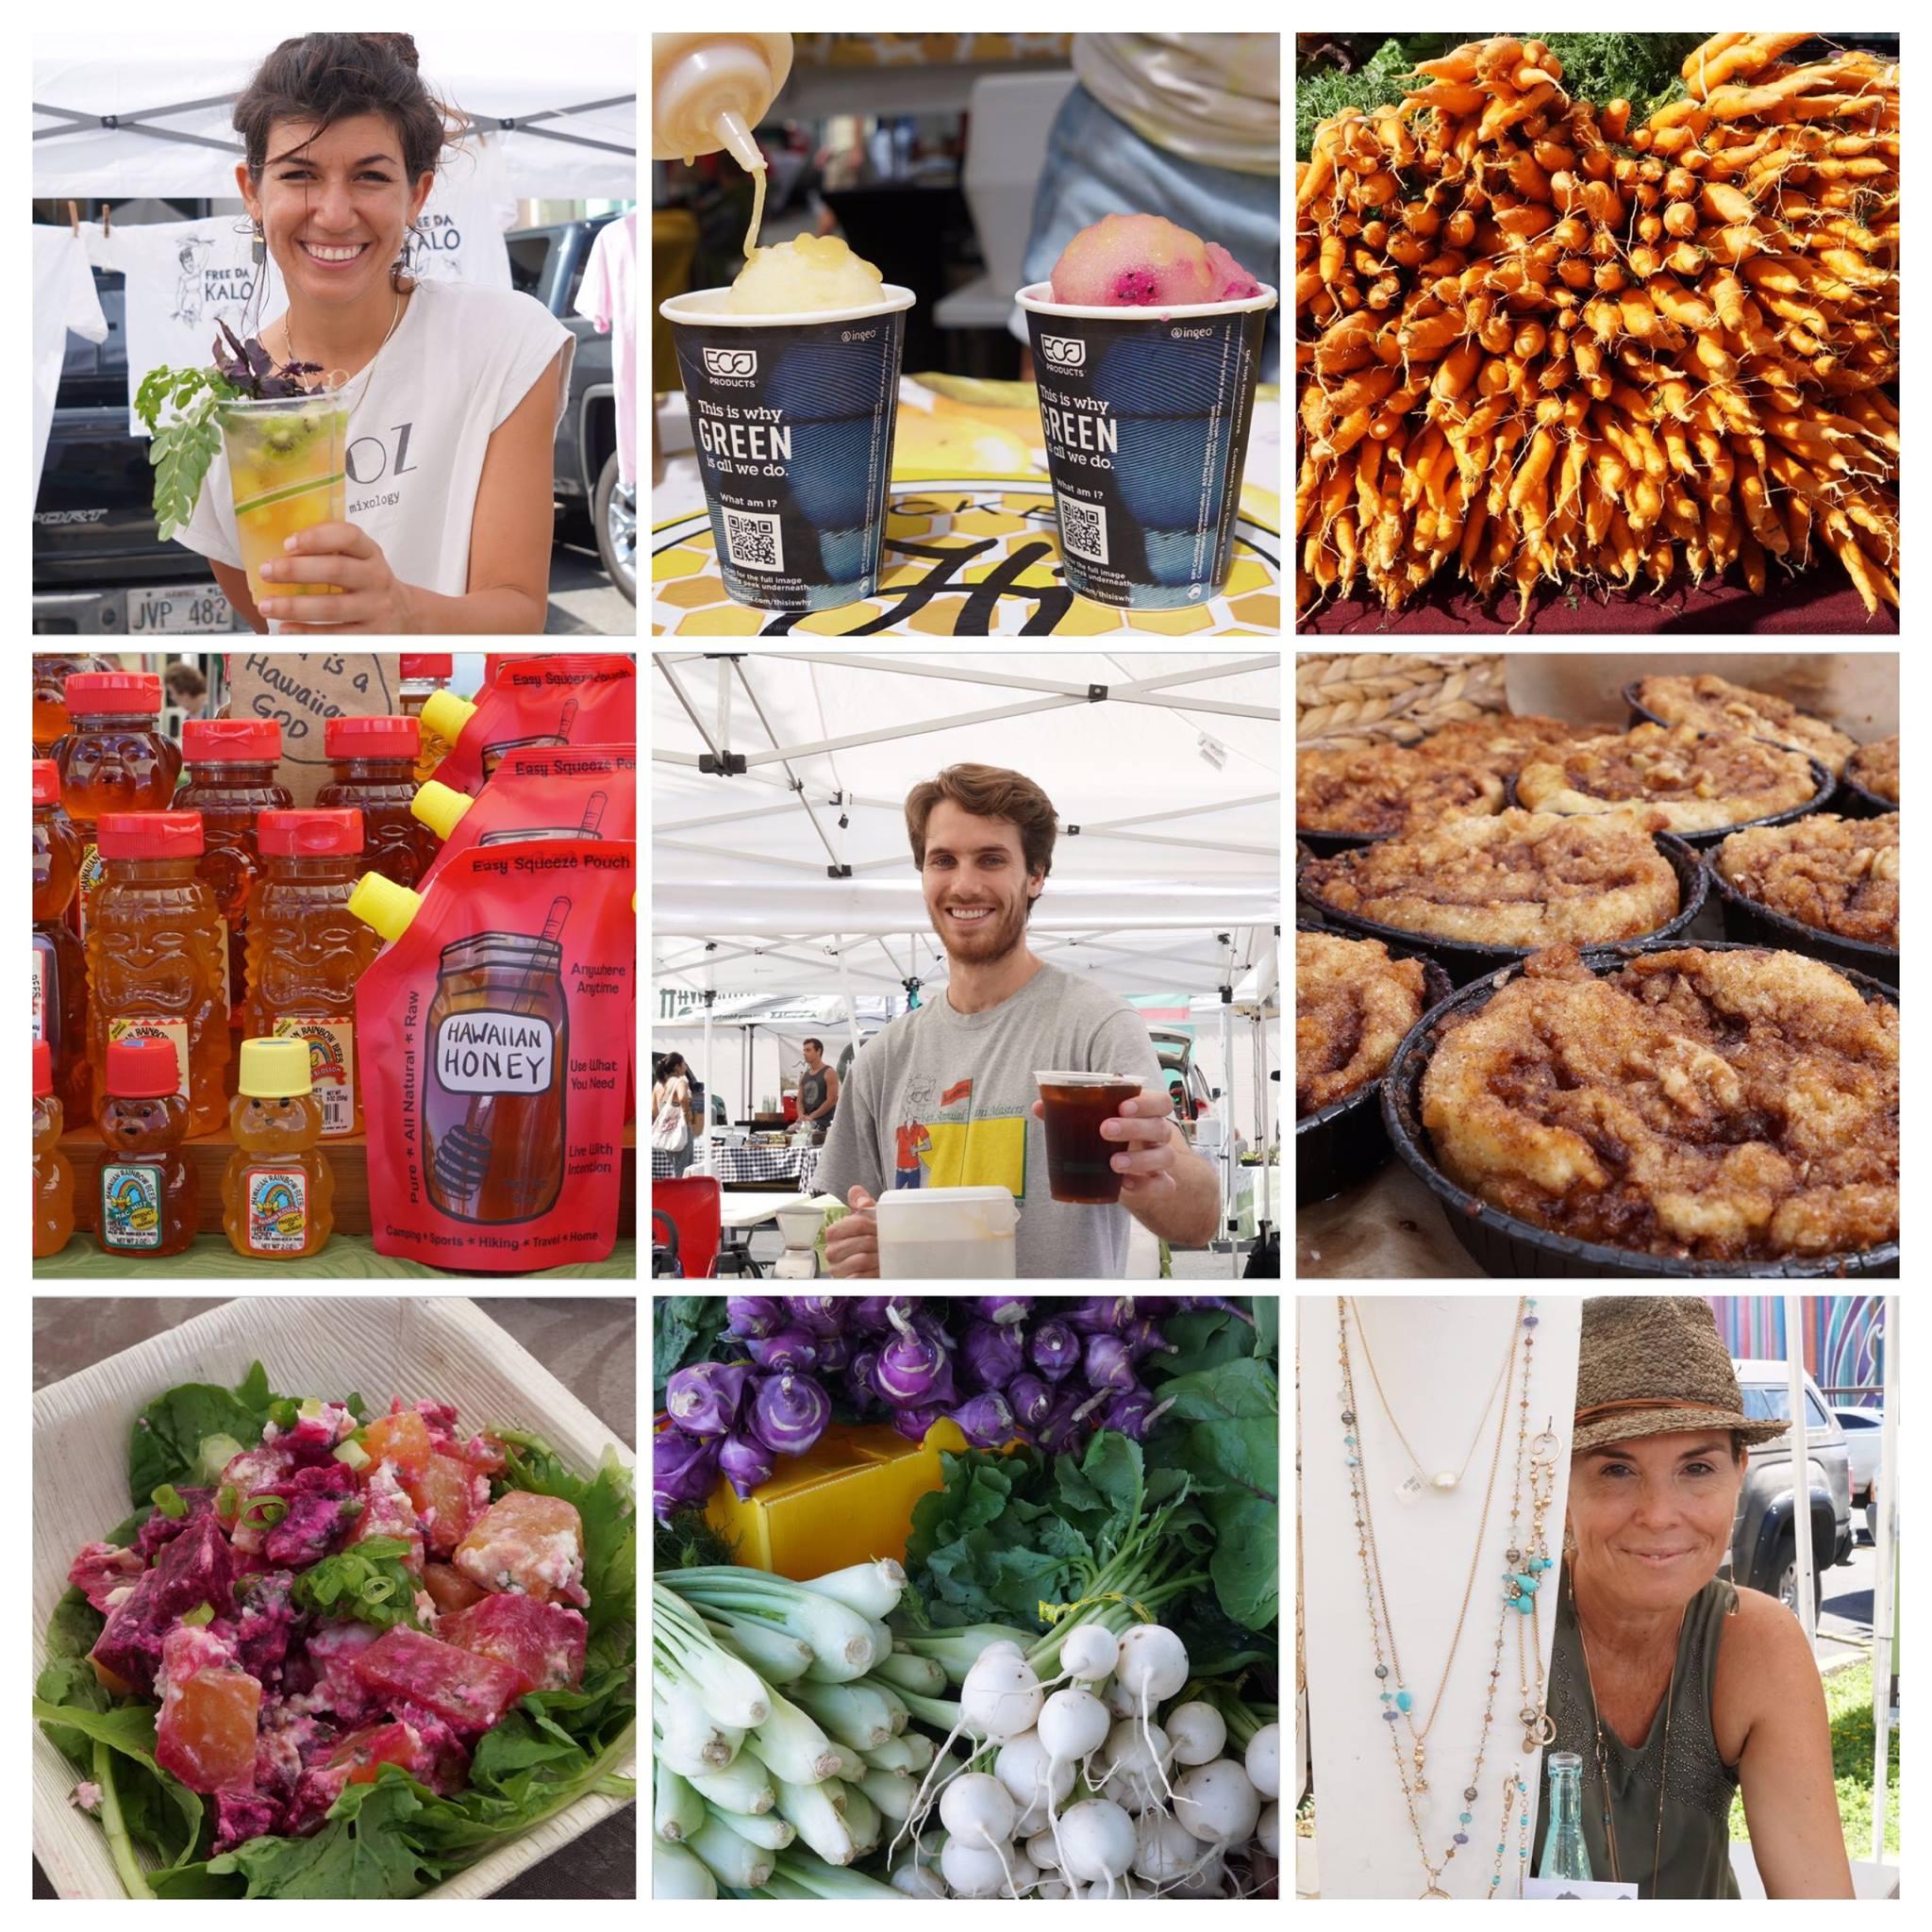 Photo: Kakaako Farmer's Market Facebook page